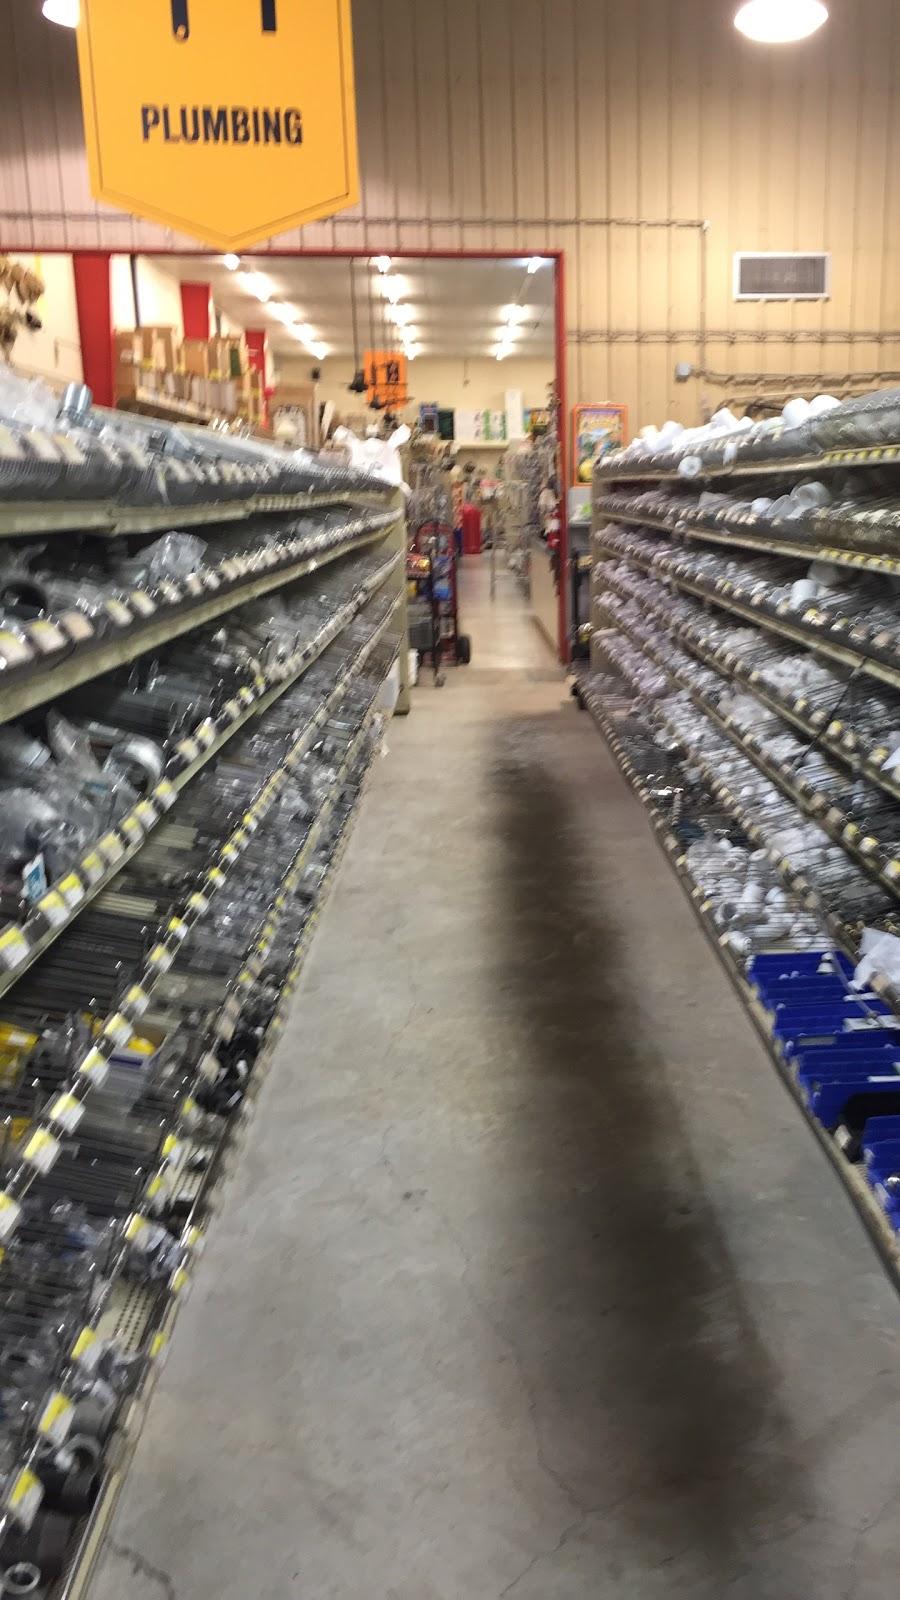 Vernons Hardware - hardware store  | Photo 9 of 10 | Address: 10960 Florida Blvd, Baton Rouge, LA 70815, USA | Phone: (225) 272-0955